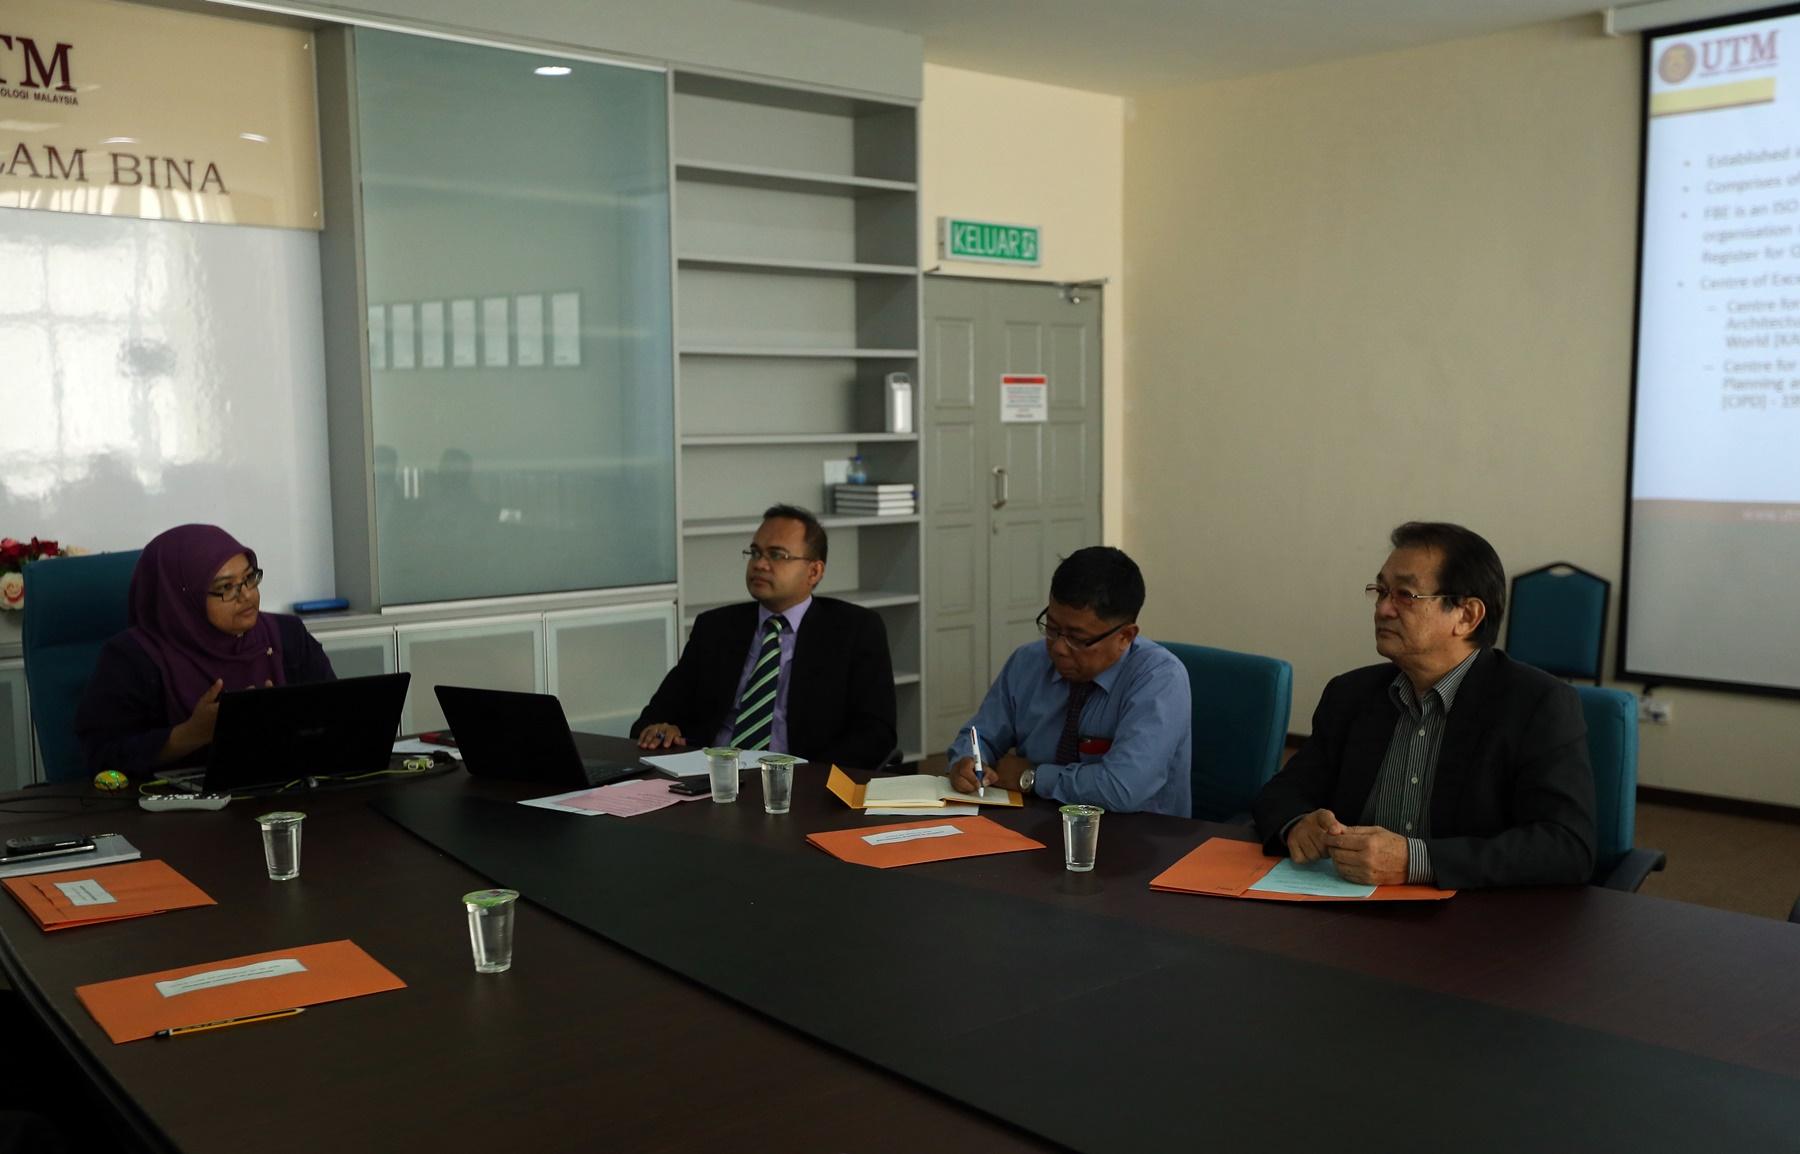 External Examiner Visit (Department of Quantity Surveying) – 3 June 2015